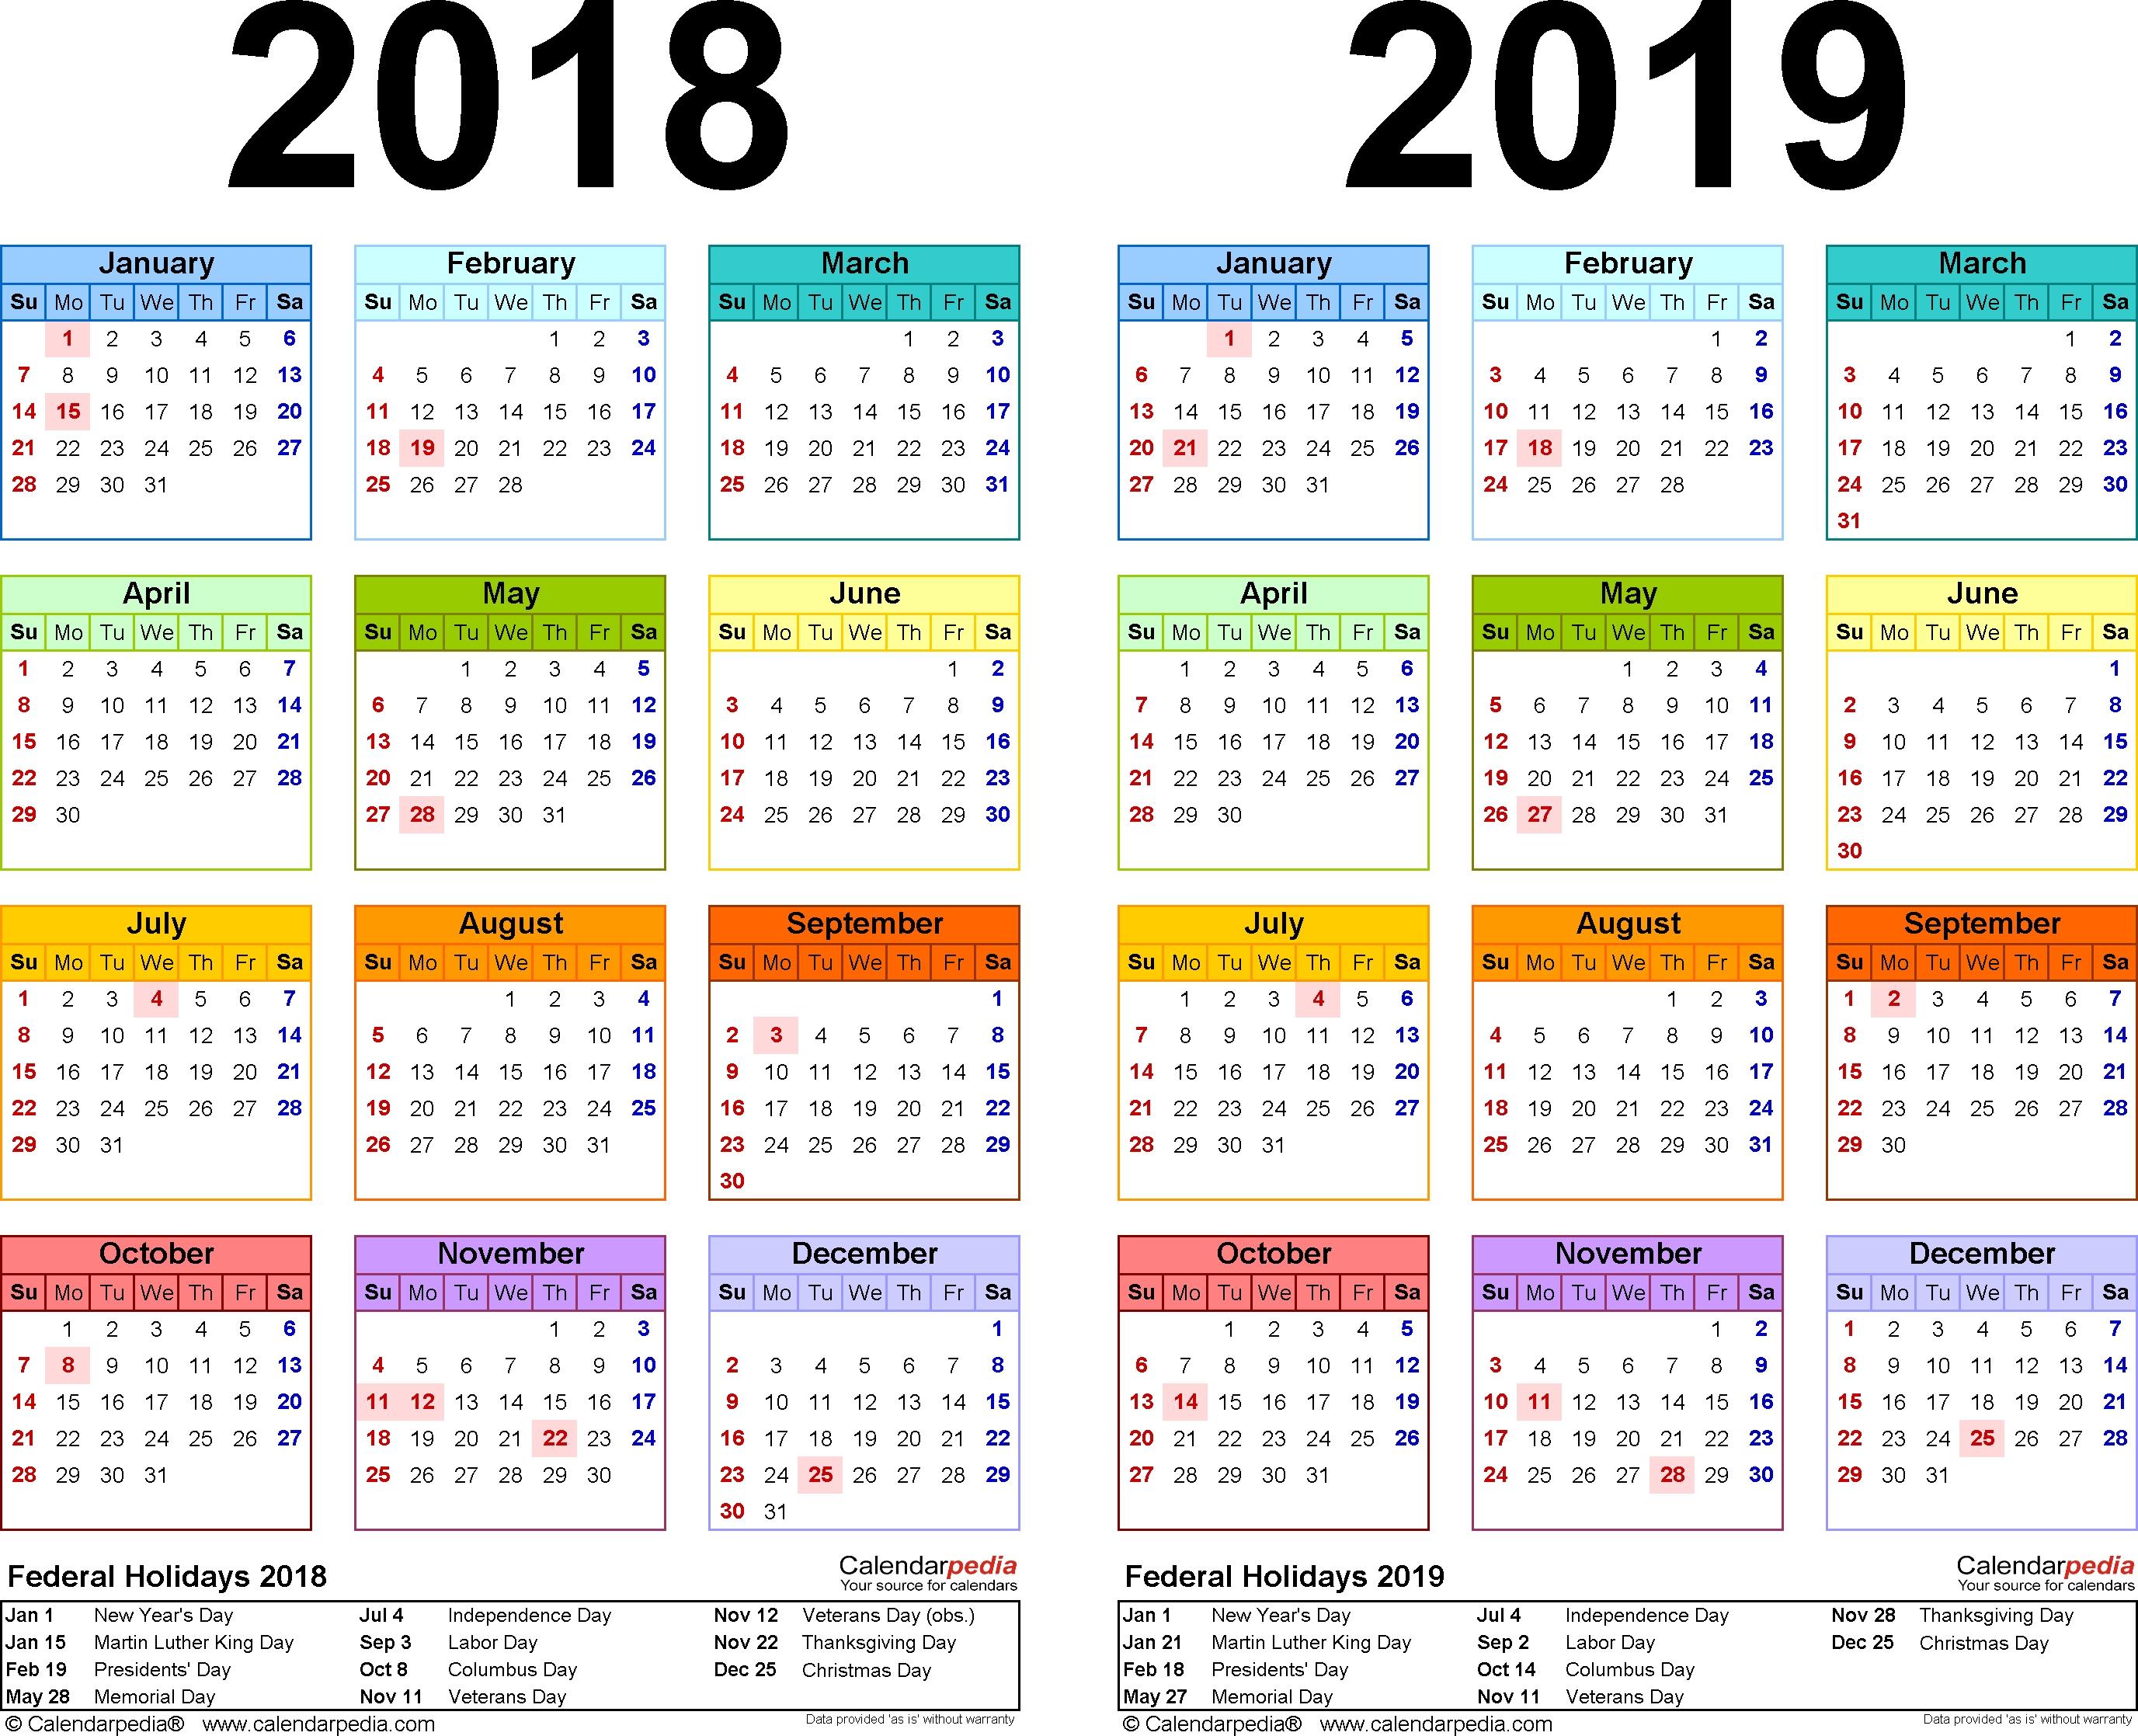 2018-2019 Calendar - Free Printable Two-Year Pdf Calendars 1 Calendar Month Calculator